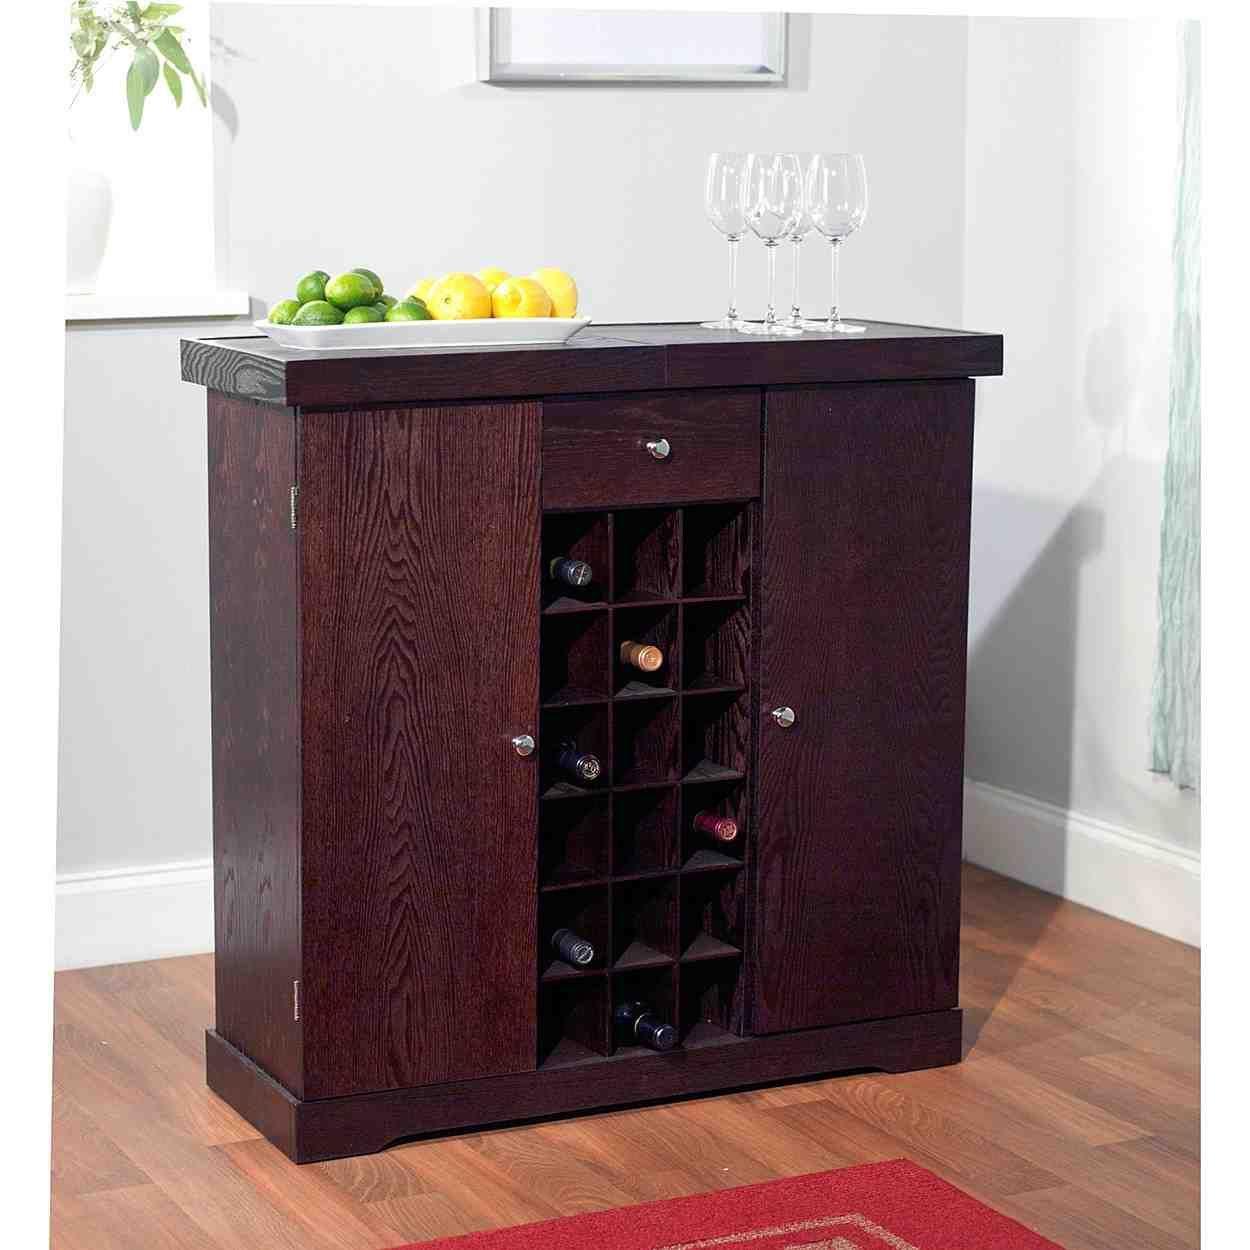 Tms Wine Storage Cabinet Better storage cabinets